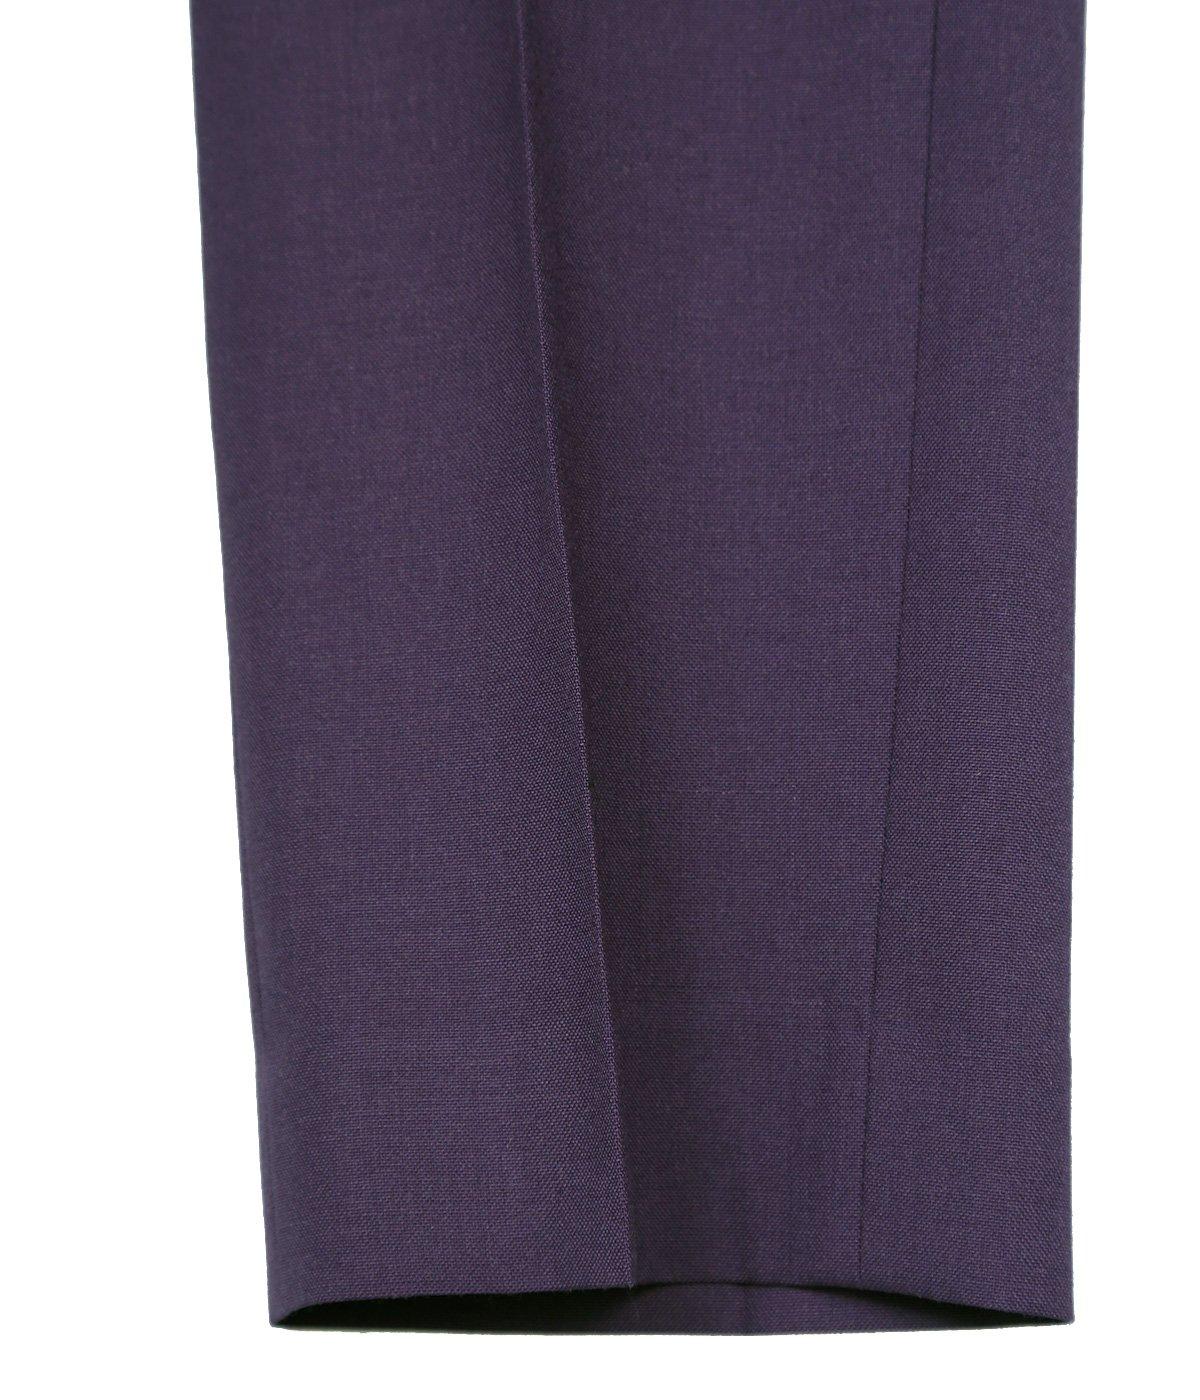 Bush Detail Wool Slacks with Velt